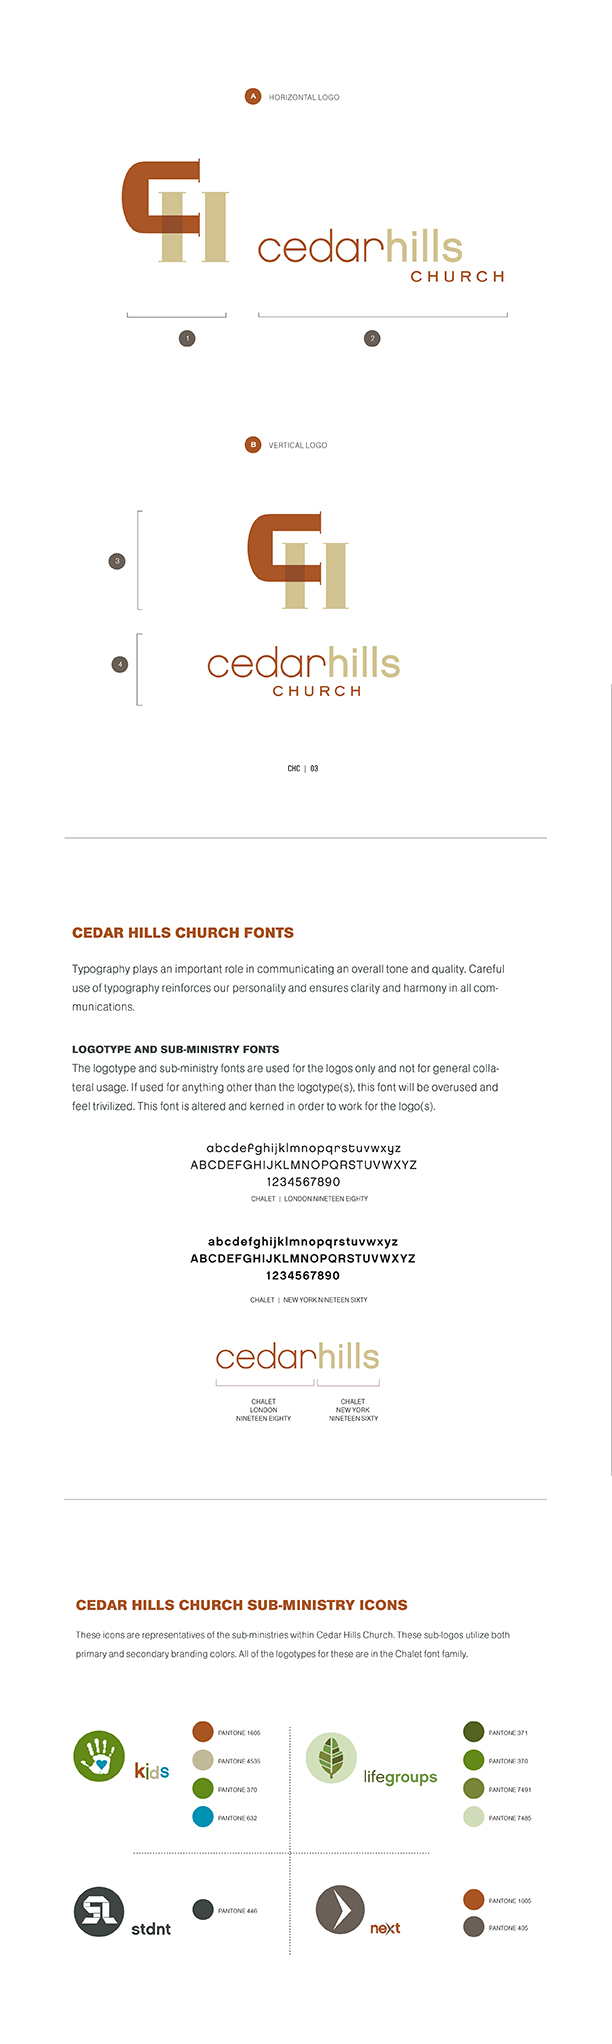 cedarhills_brand3-10